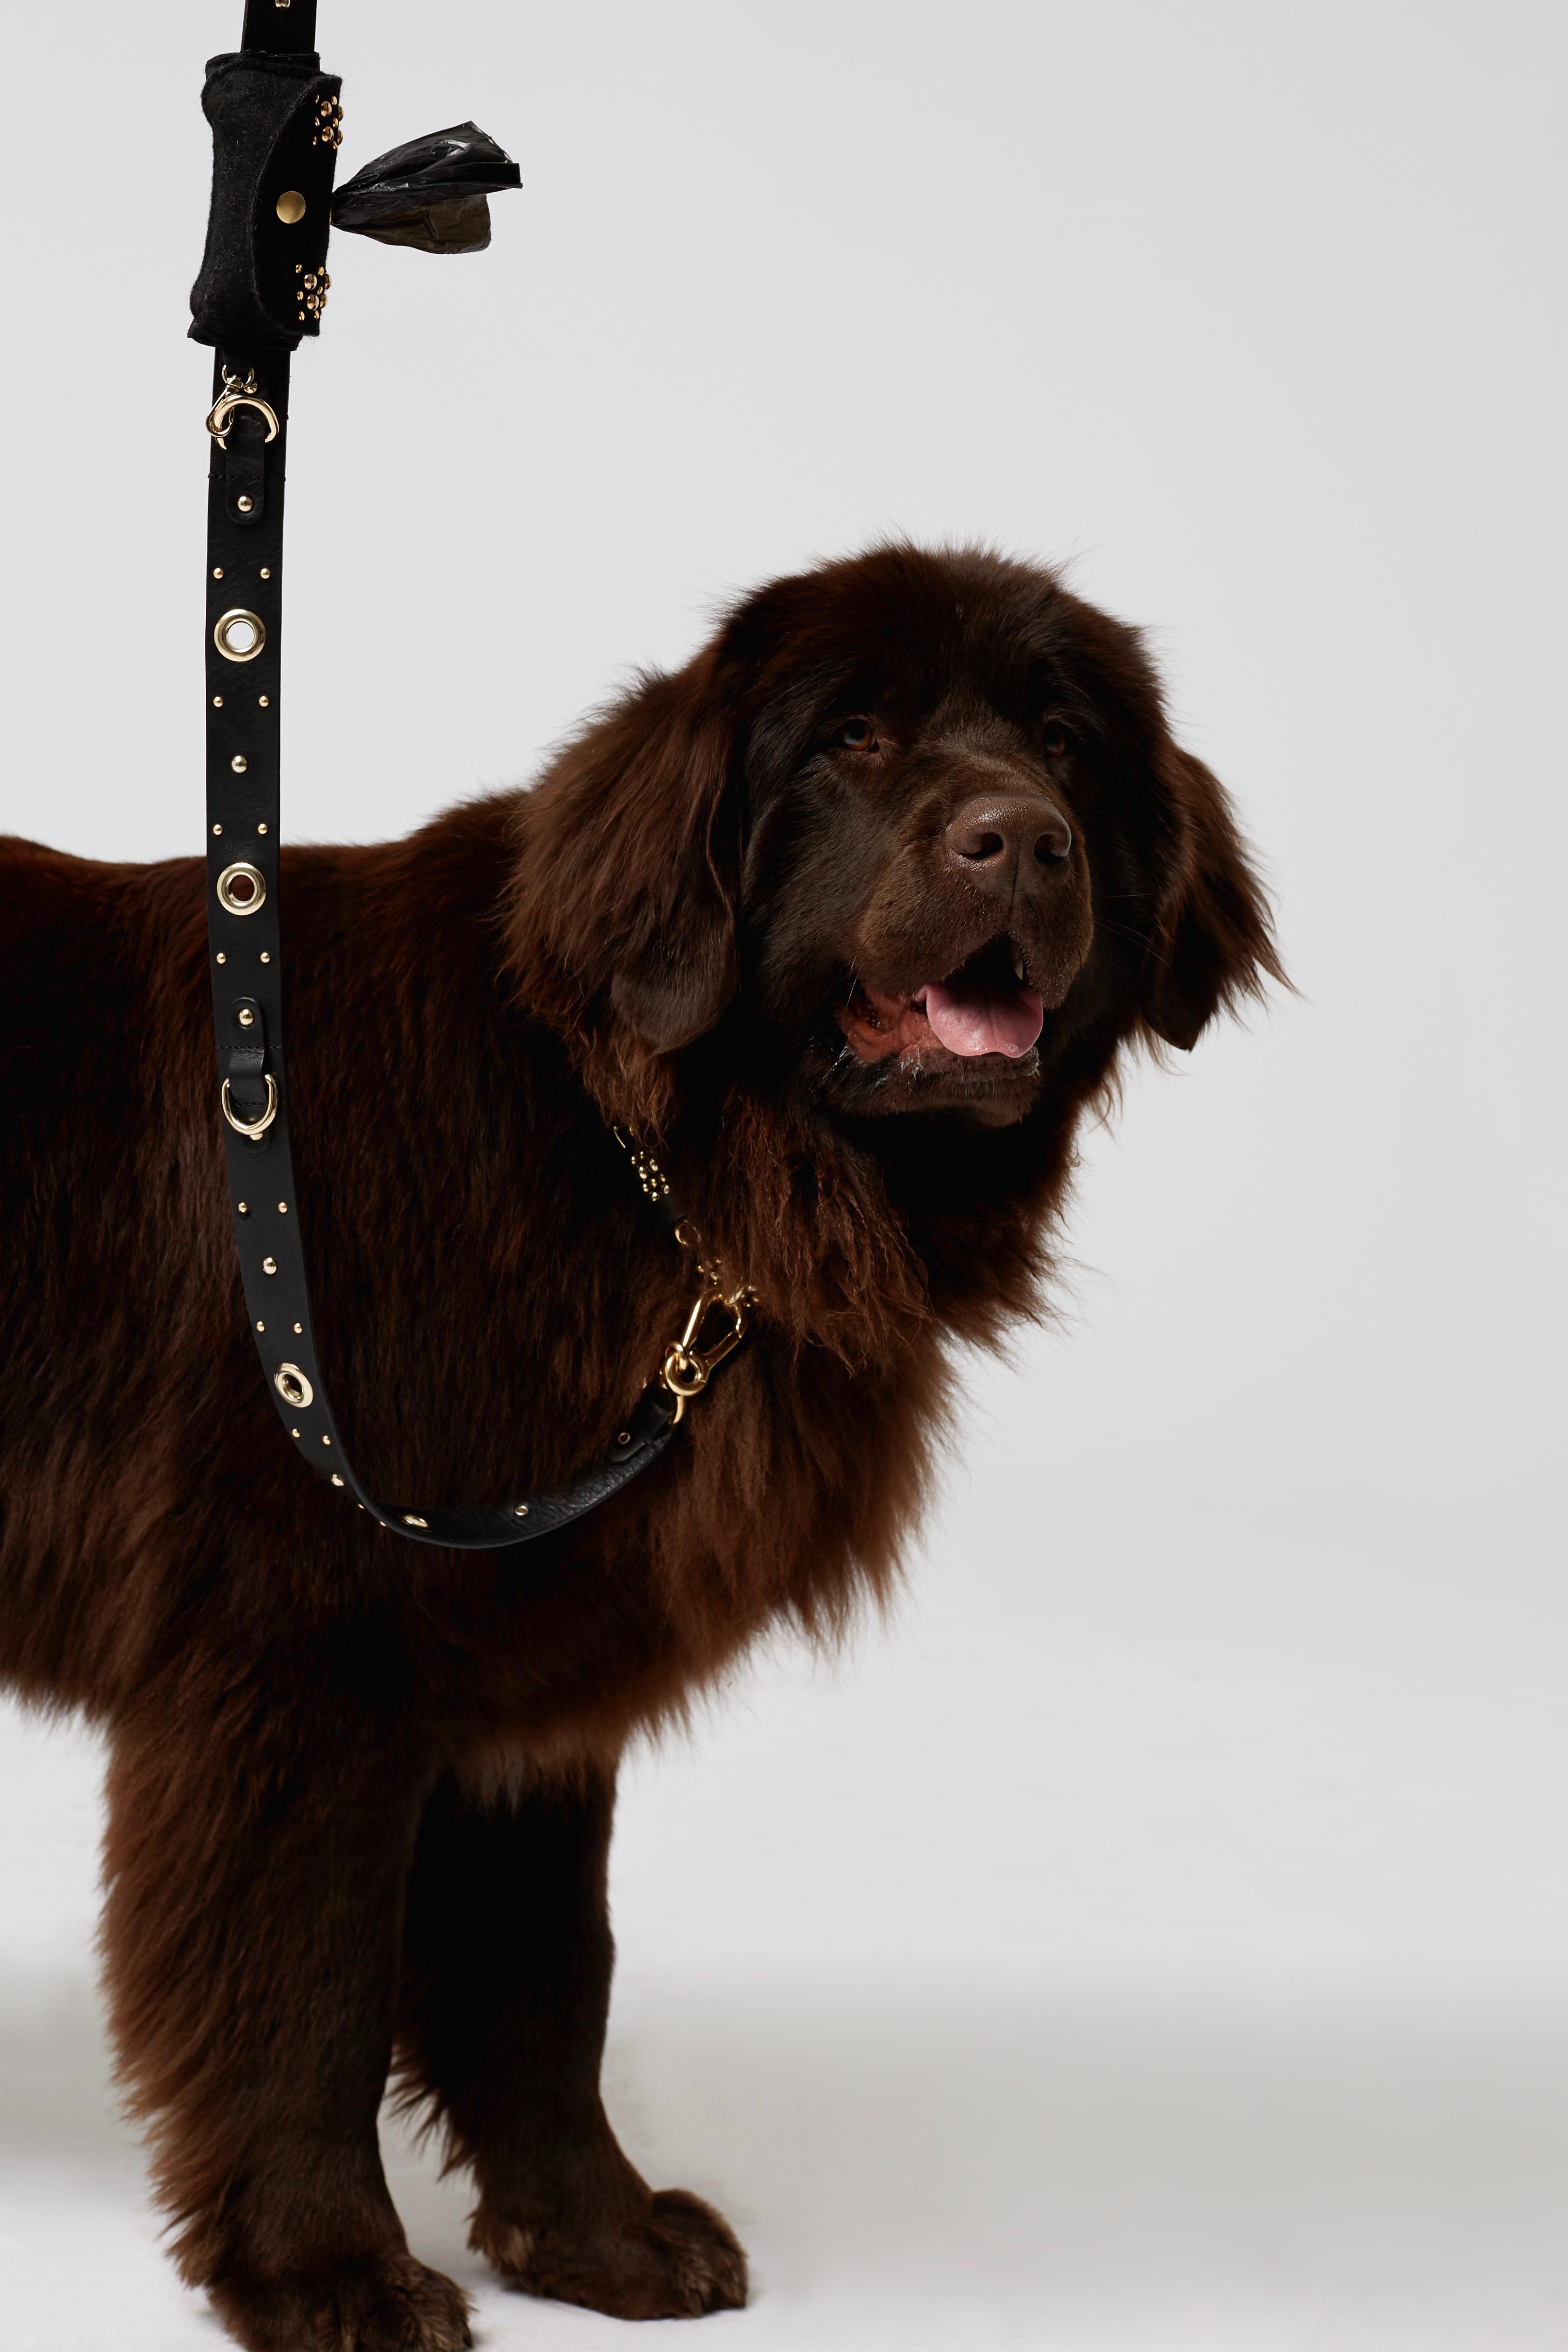 69bef40457c Dorothee Schumacher Clean-to-go Doggy Bag Dispenser Pouch in Black ...